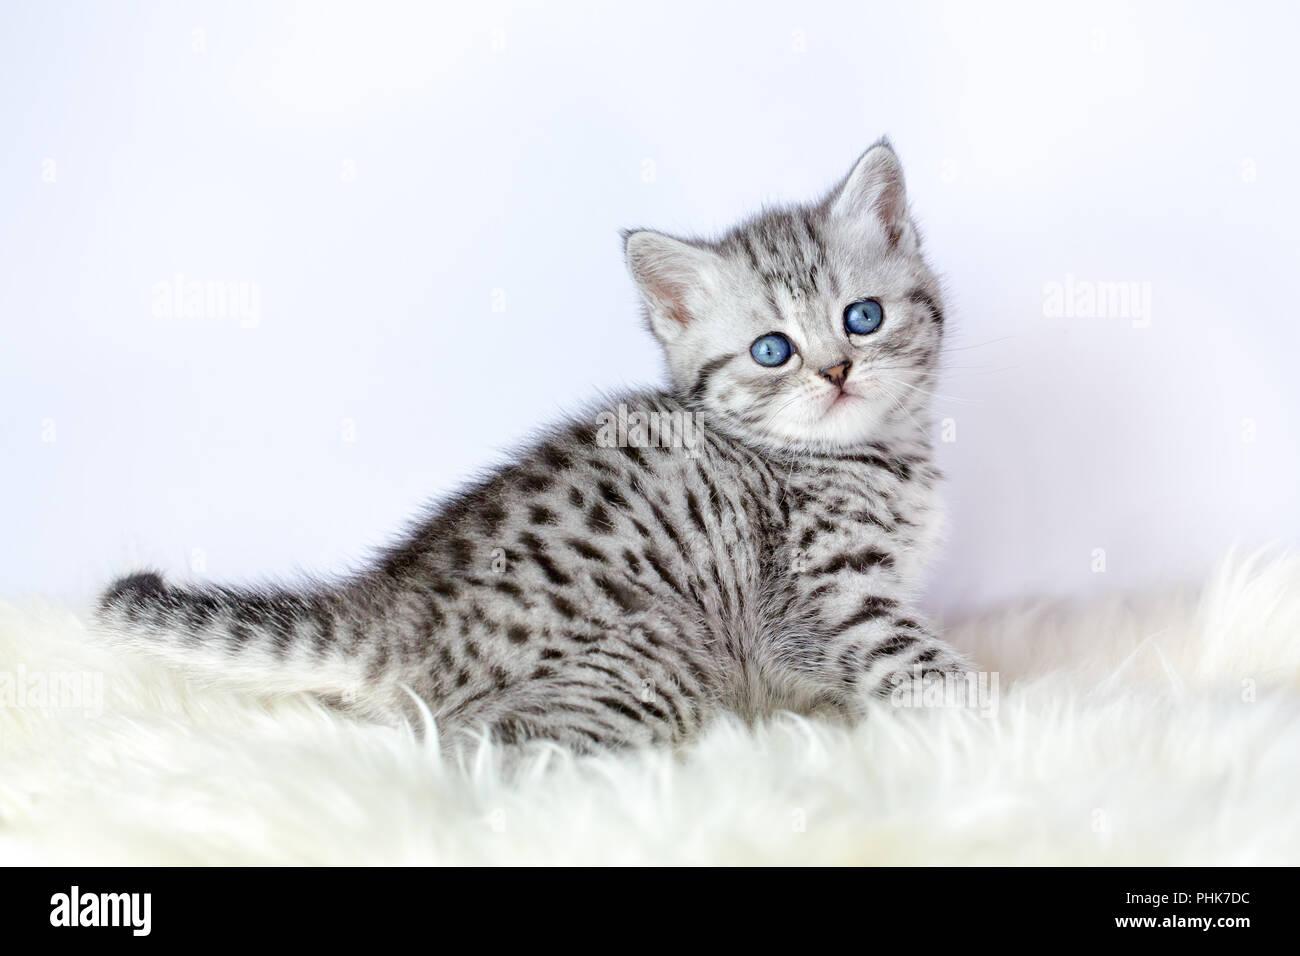 Black Silver Tabby Kitten Sits On Sheepskin Stock Photo Alamy